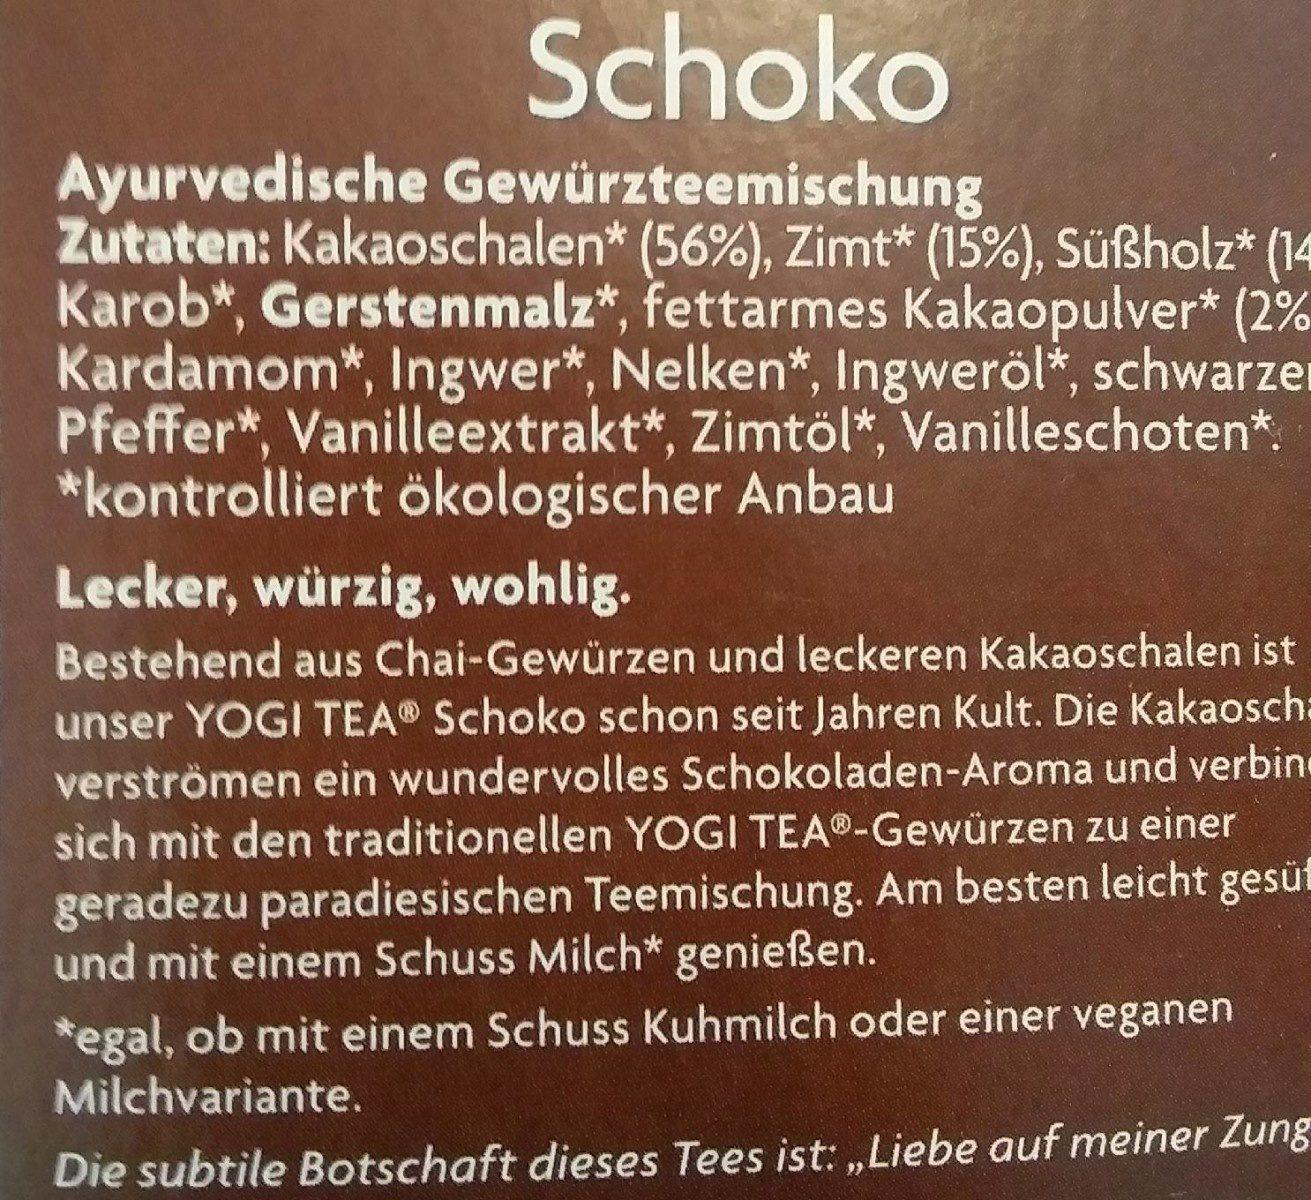 Yogi Tea Schoko, Aztec Spice - Informations nutritionnelles - fr